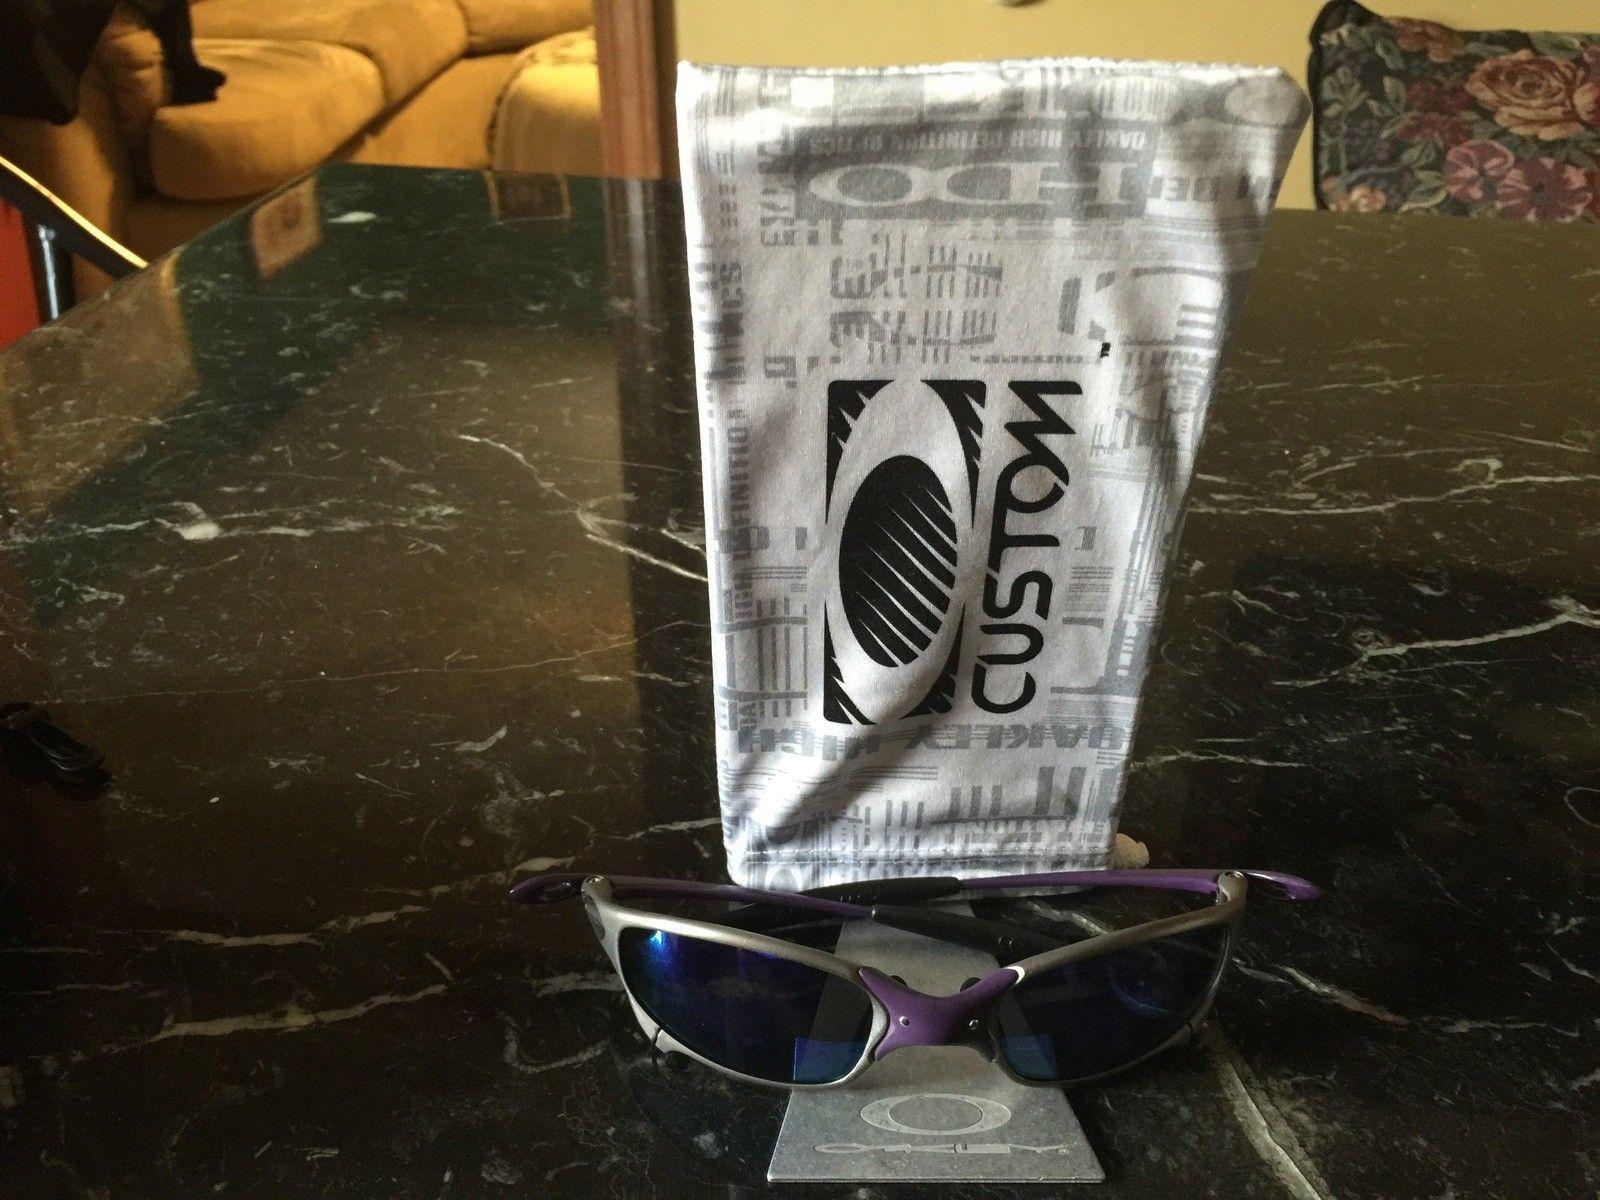 Oakley metal base logo  microfiber bag holder/display can put side ways too - image.jpg